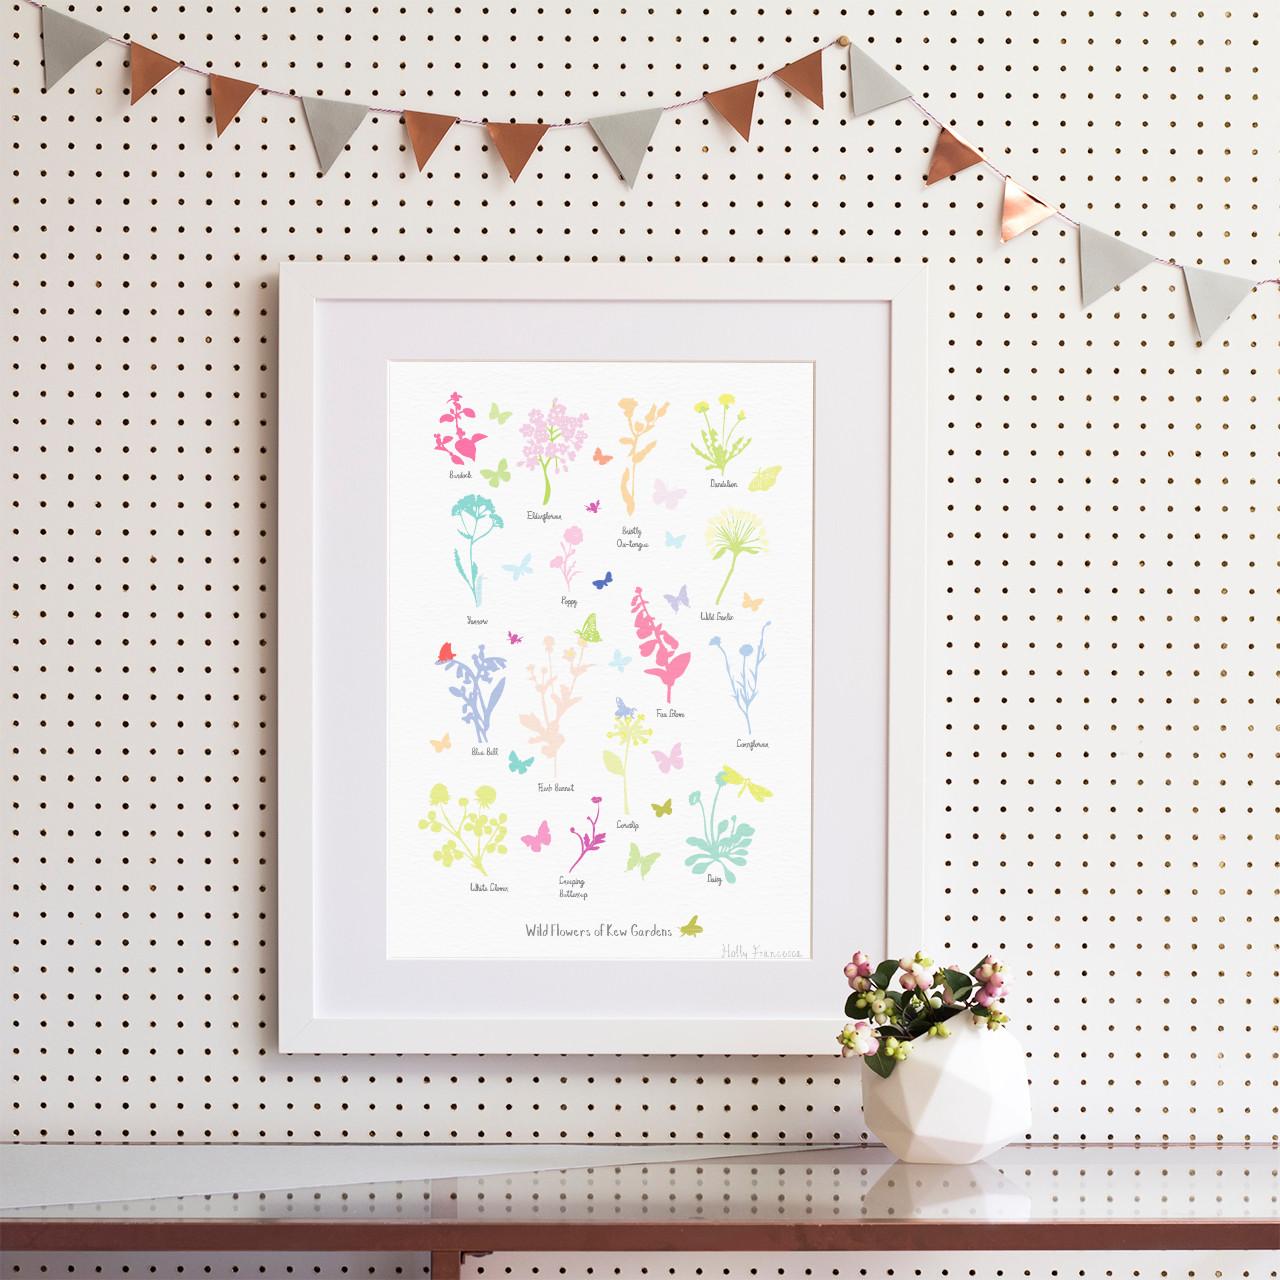 Wildflowers of Kew Gardens Art Print (Various Sizes) - Holly Francesca